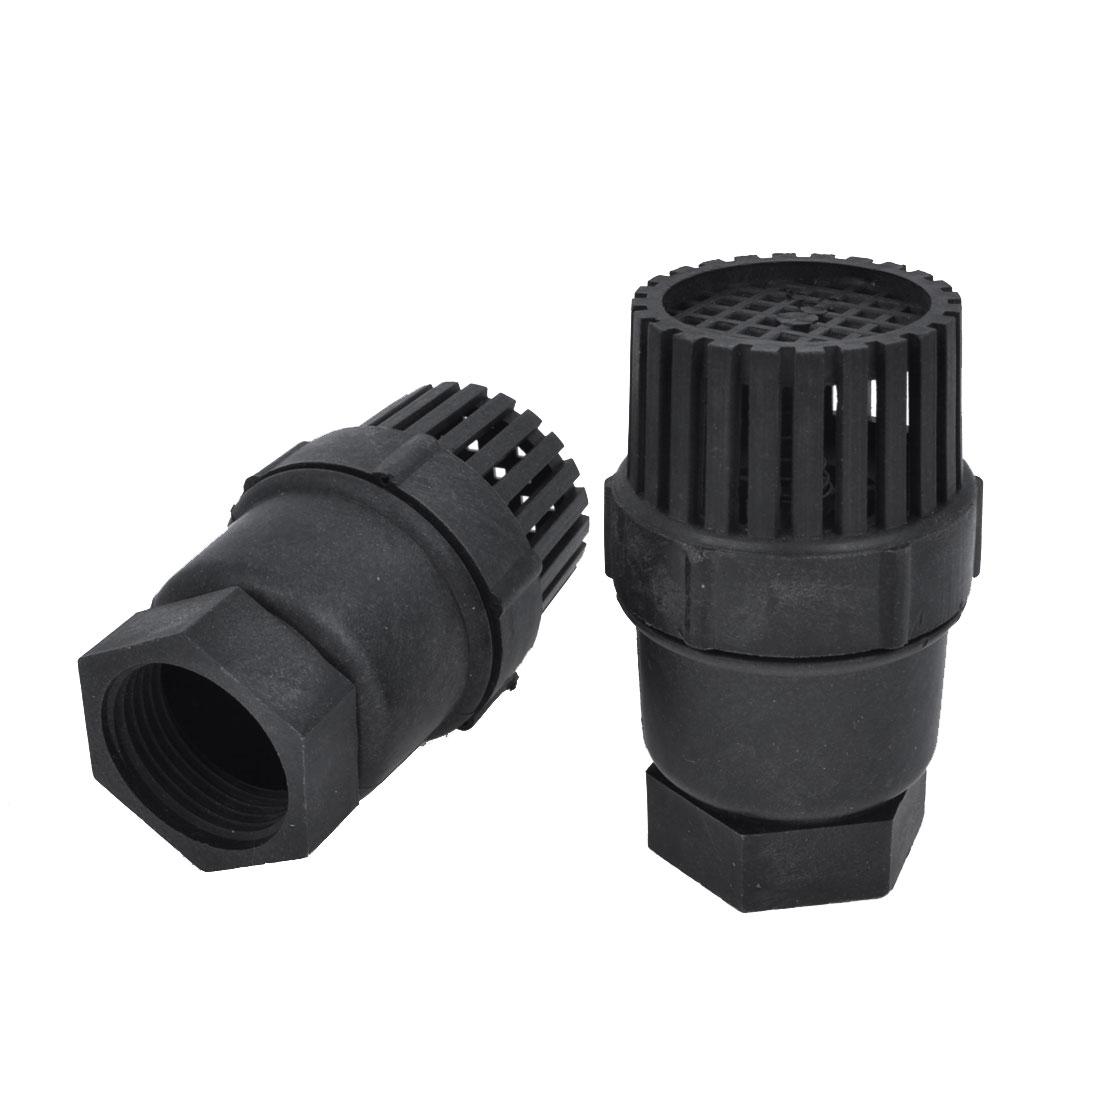 "2 PCS Replacement 1.2"" Thread Dia Black Plastic PVC Foot Bottom Valves"